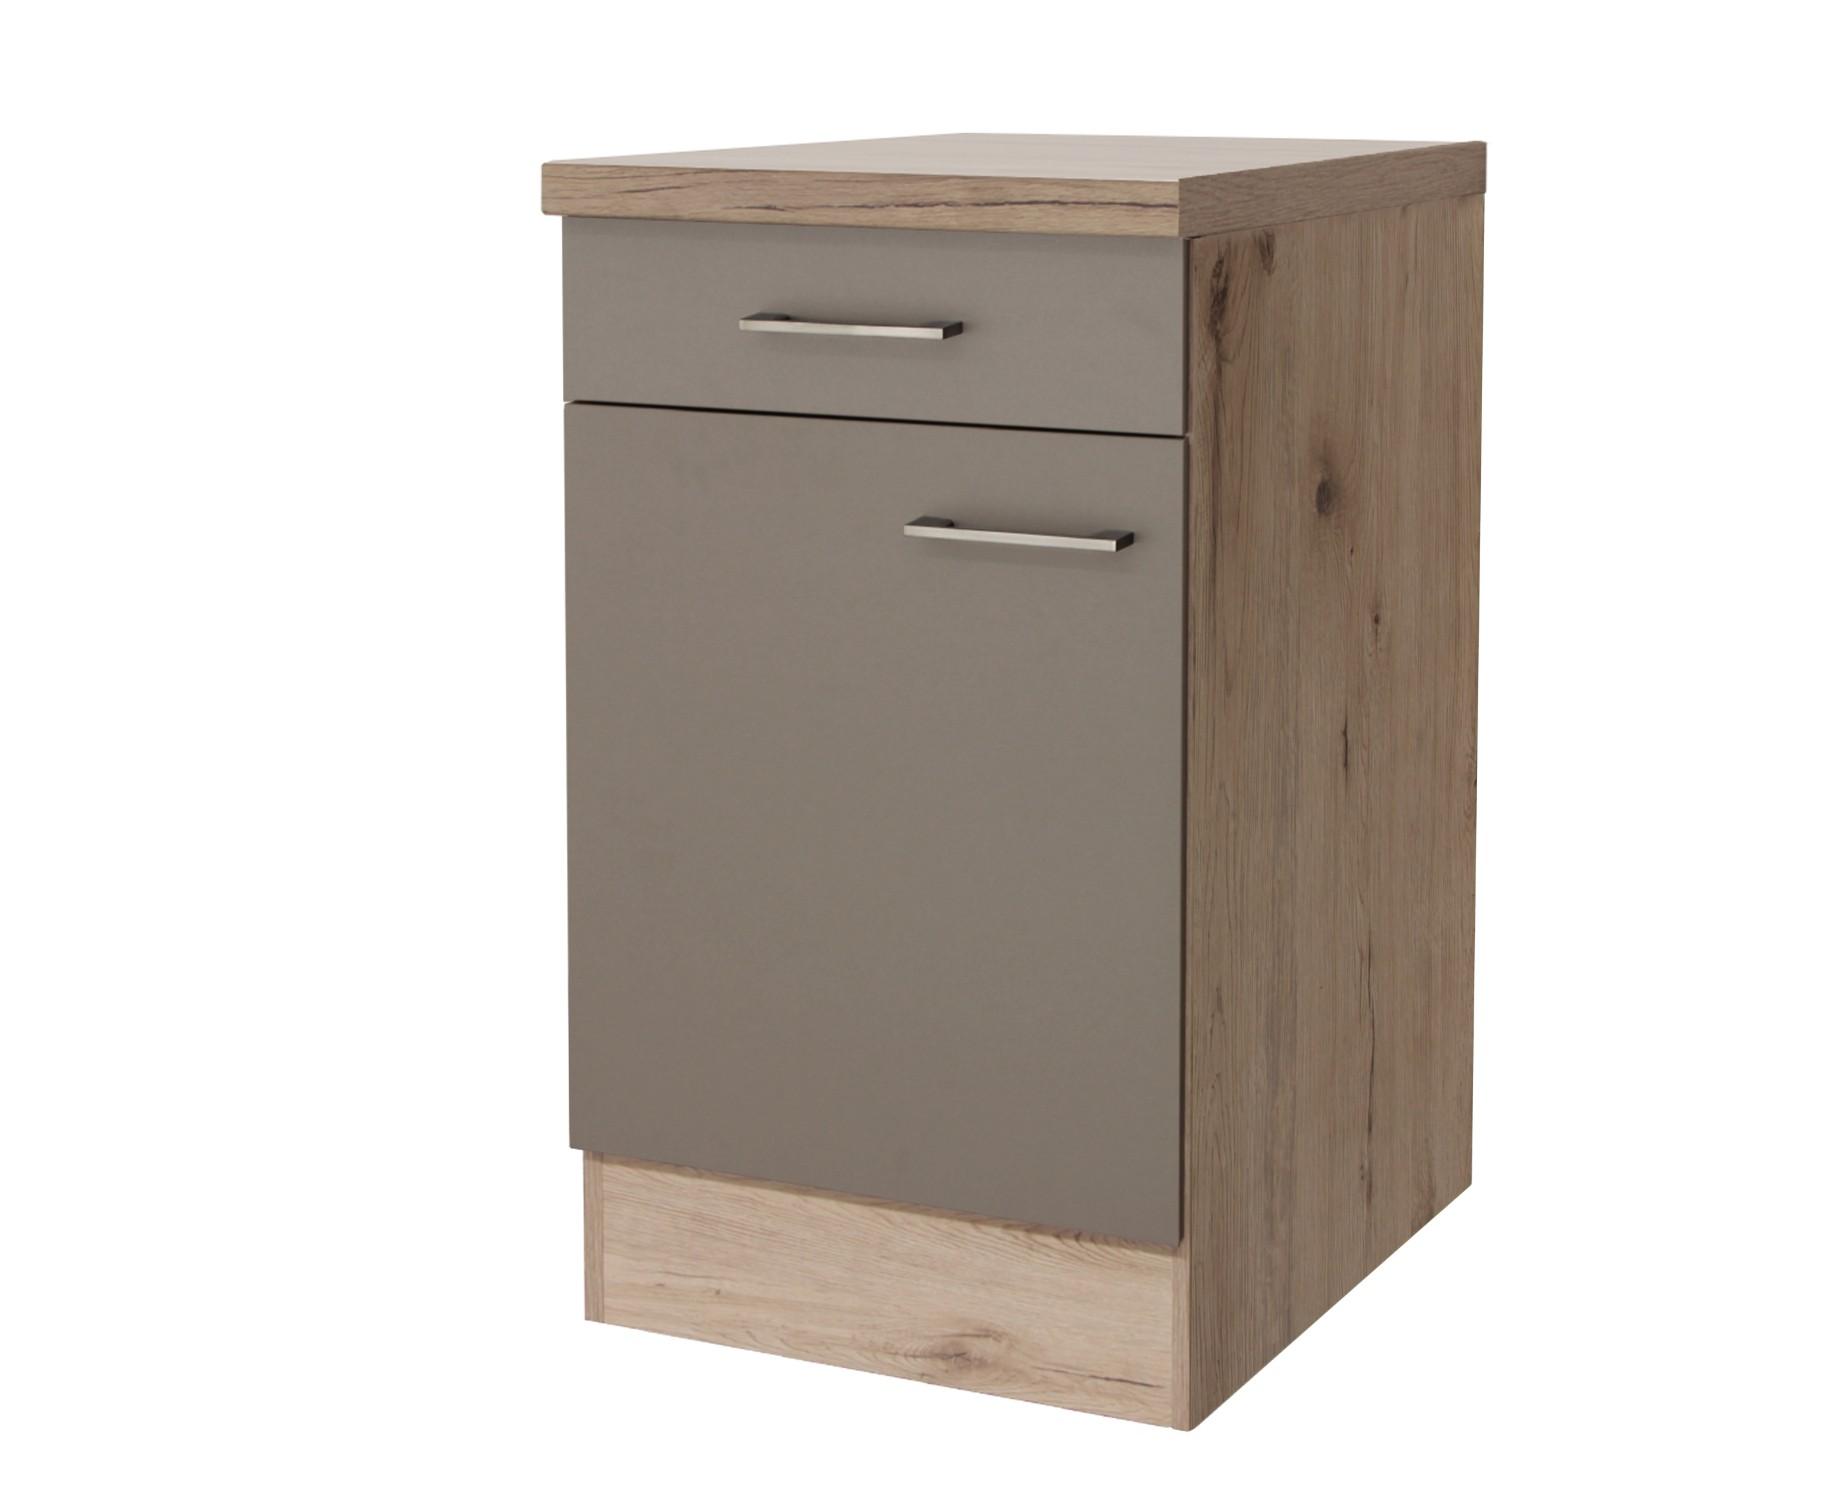 k chen unterschrank riva 1 t rig 50 cm breit bronze metallic k che riva. Black Bedroom Furniture Sets. Home Design Ideas